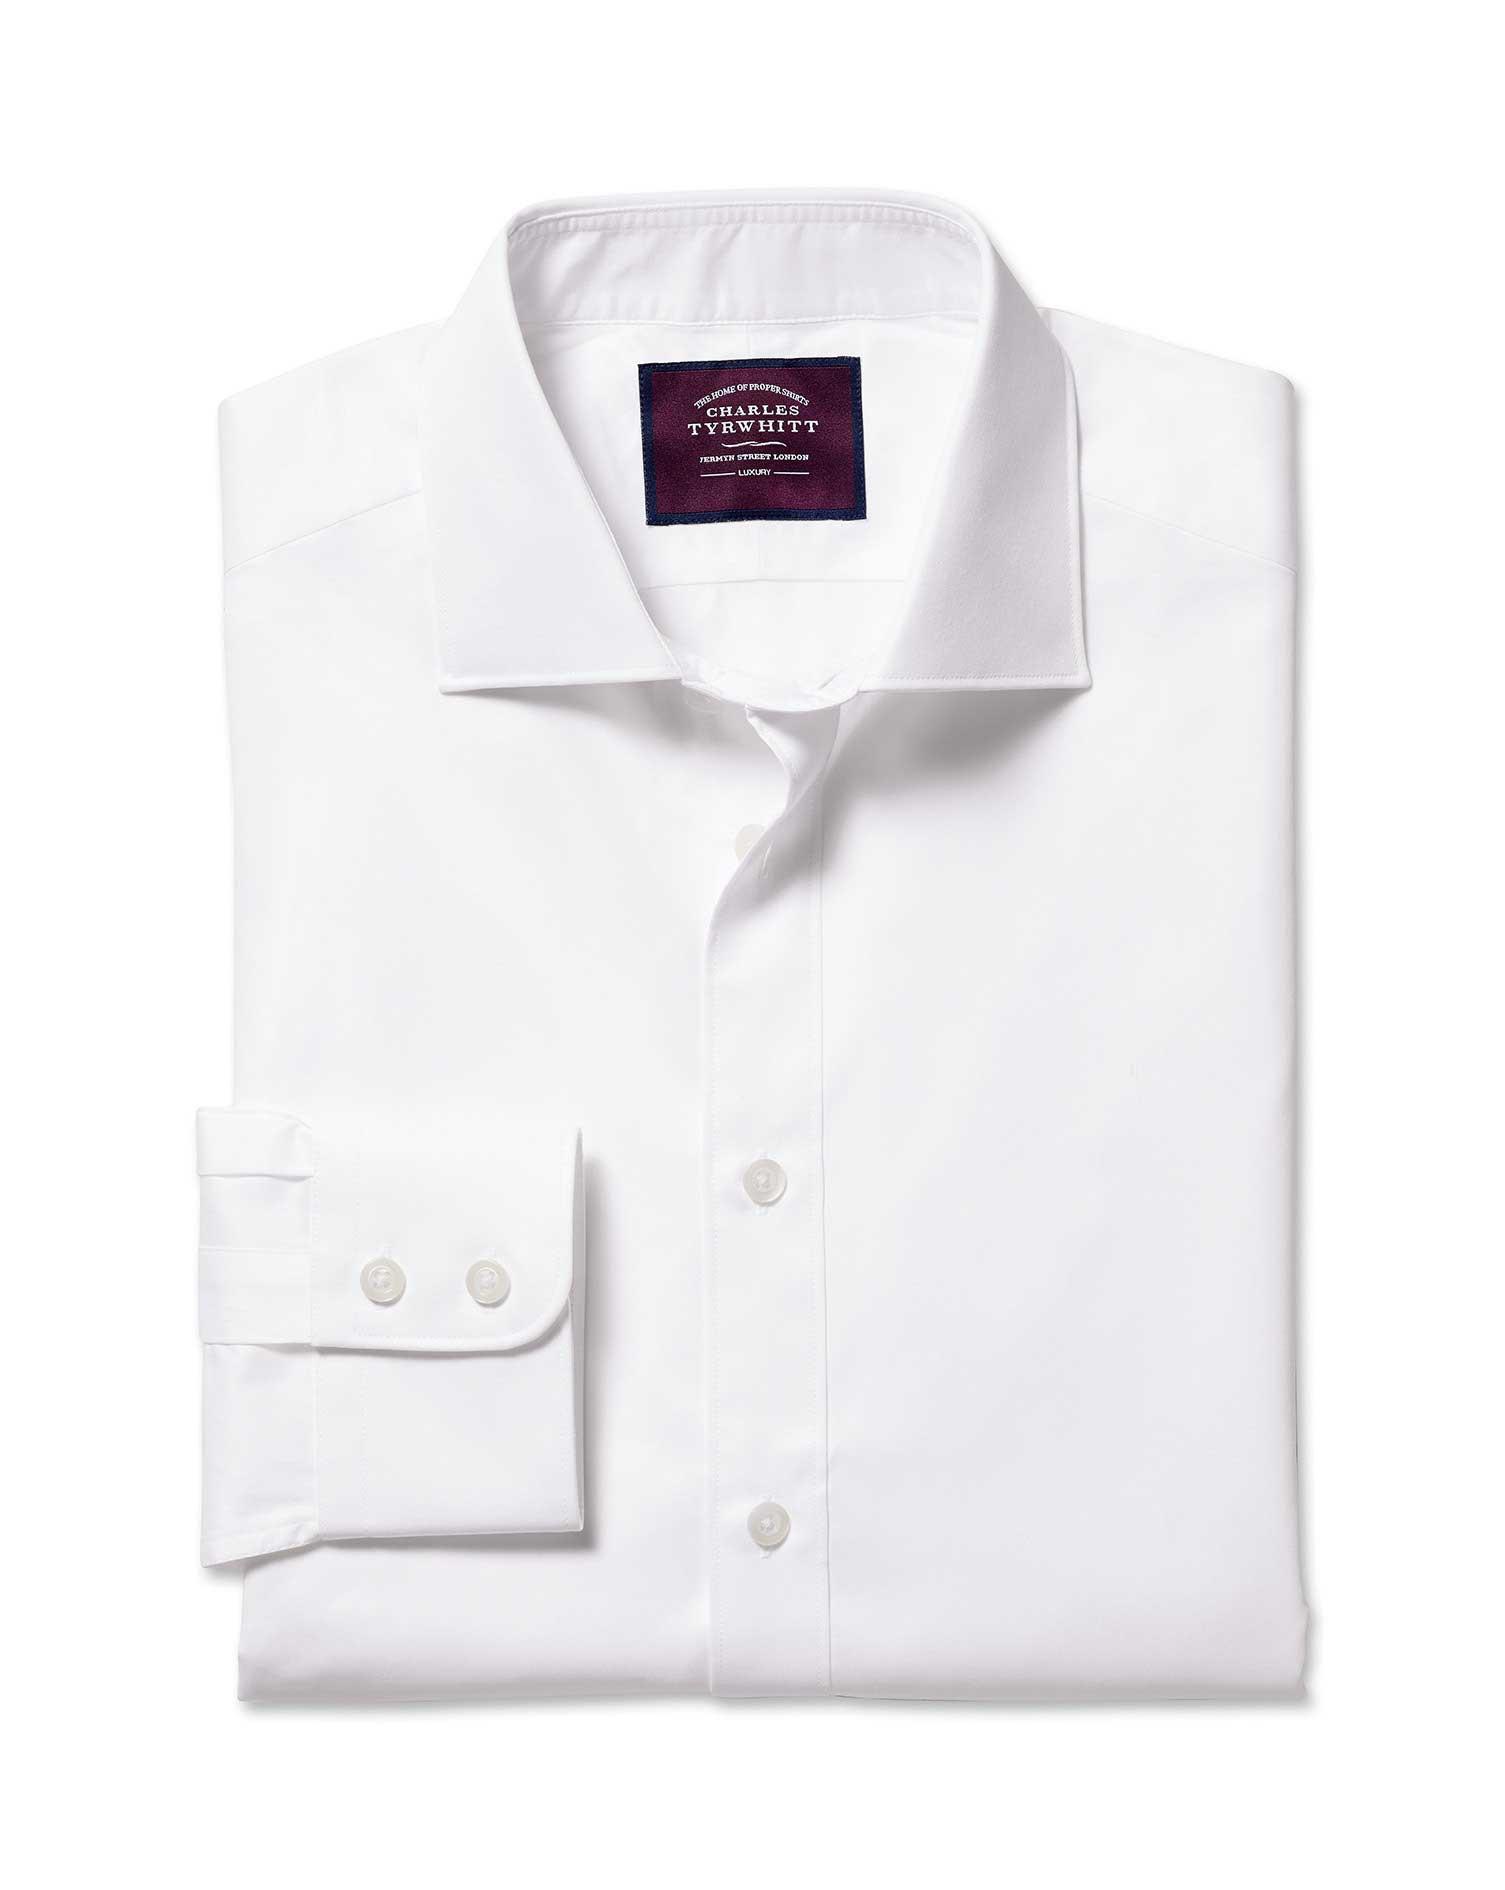 Slim Fit Semi-Cutaway Luxury Twill White Egyptian Cotton Formal Shirt Single Cuff Size 16/34 by Char